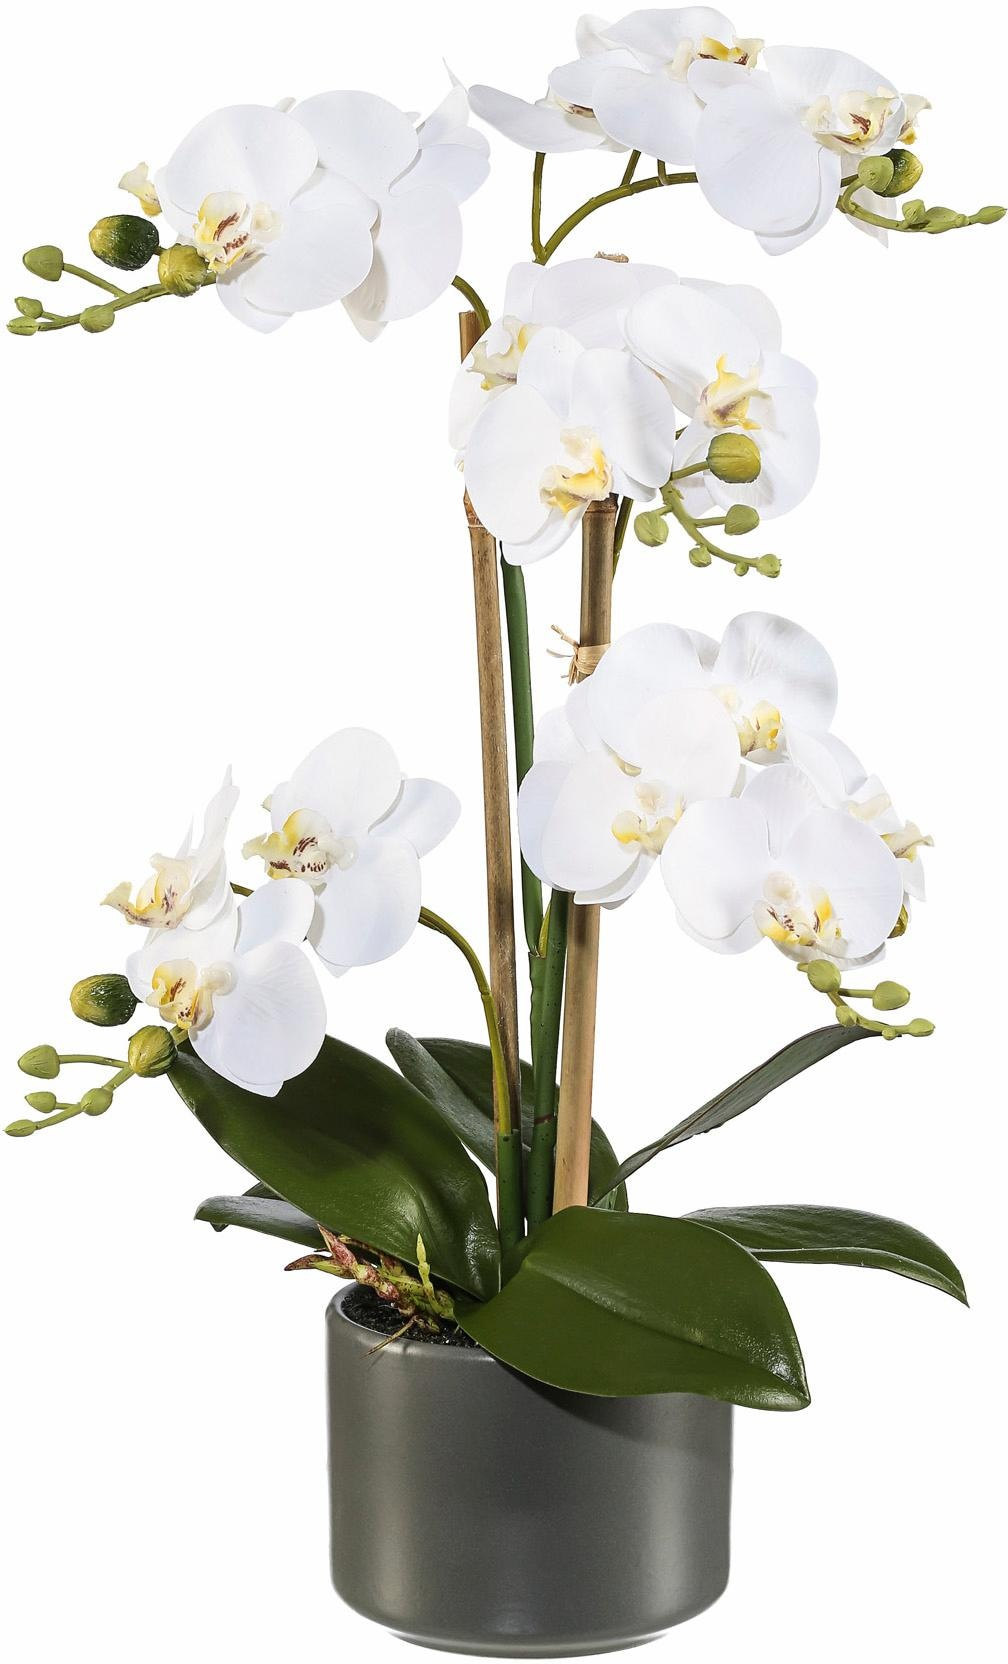 Kunstpflanze Orchidee Technik & Freizeit/Heimwerken & Garten/Garten & Balkon/Pflanzen/Kunstpflanzen/Kunst-Orchideen